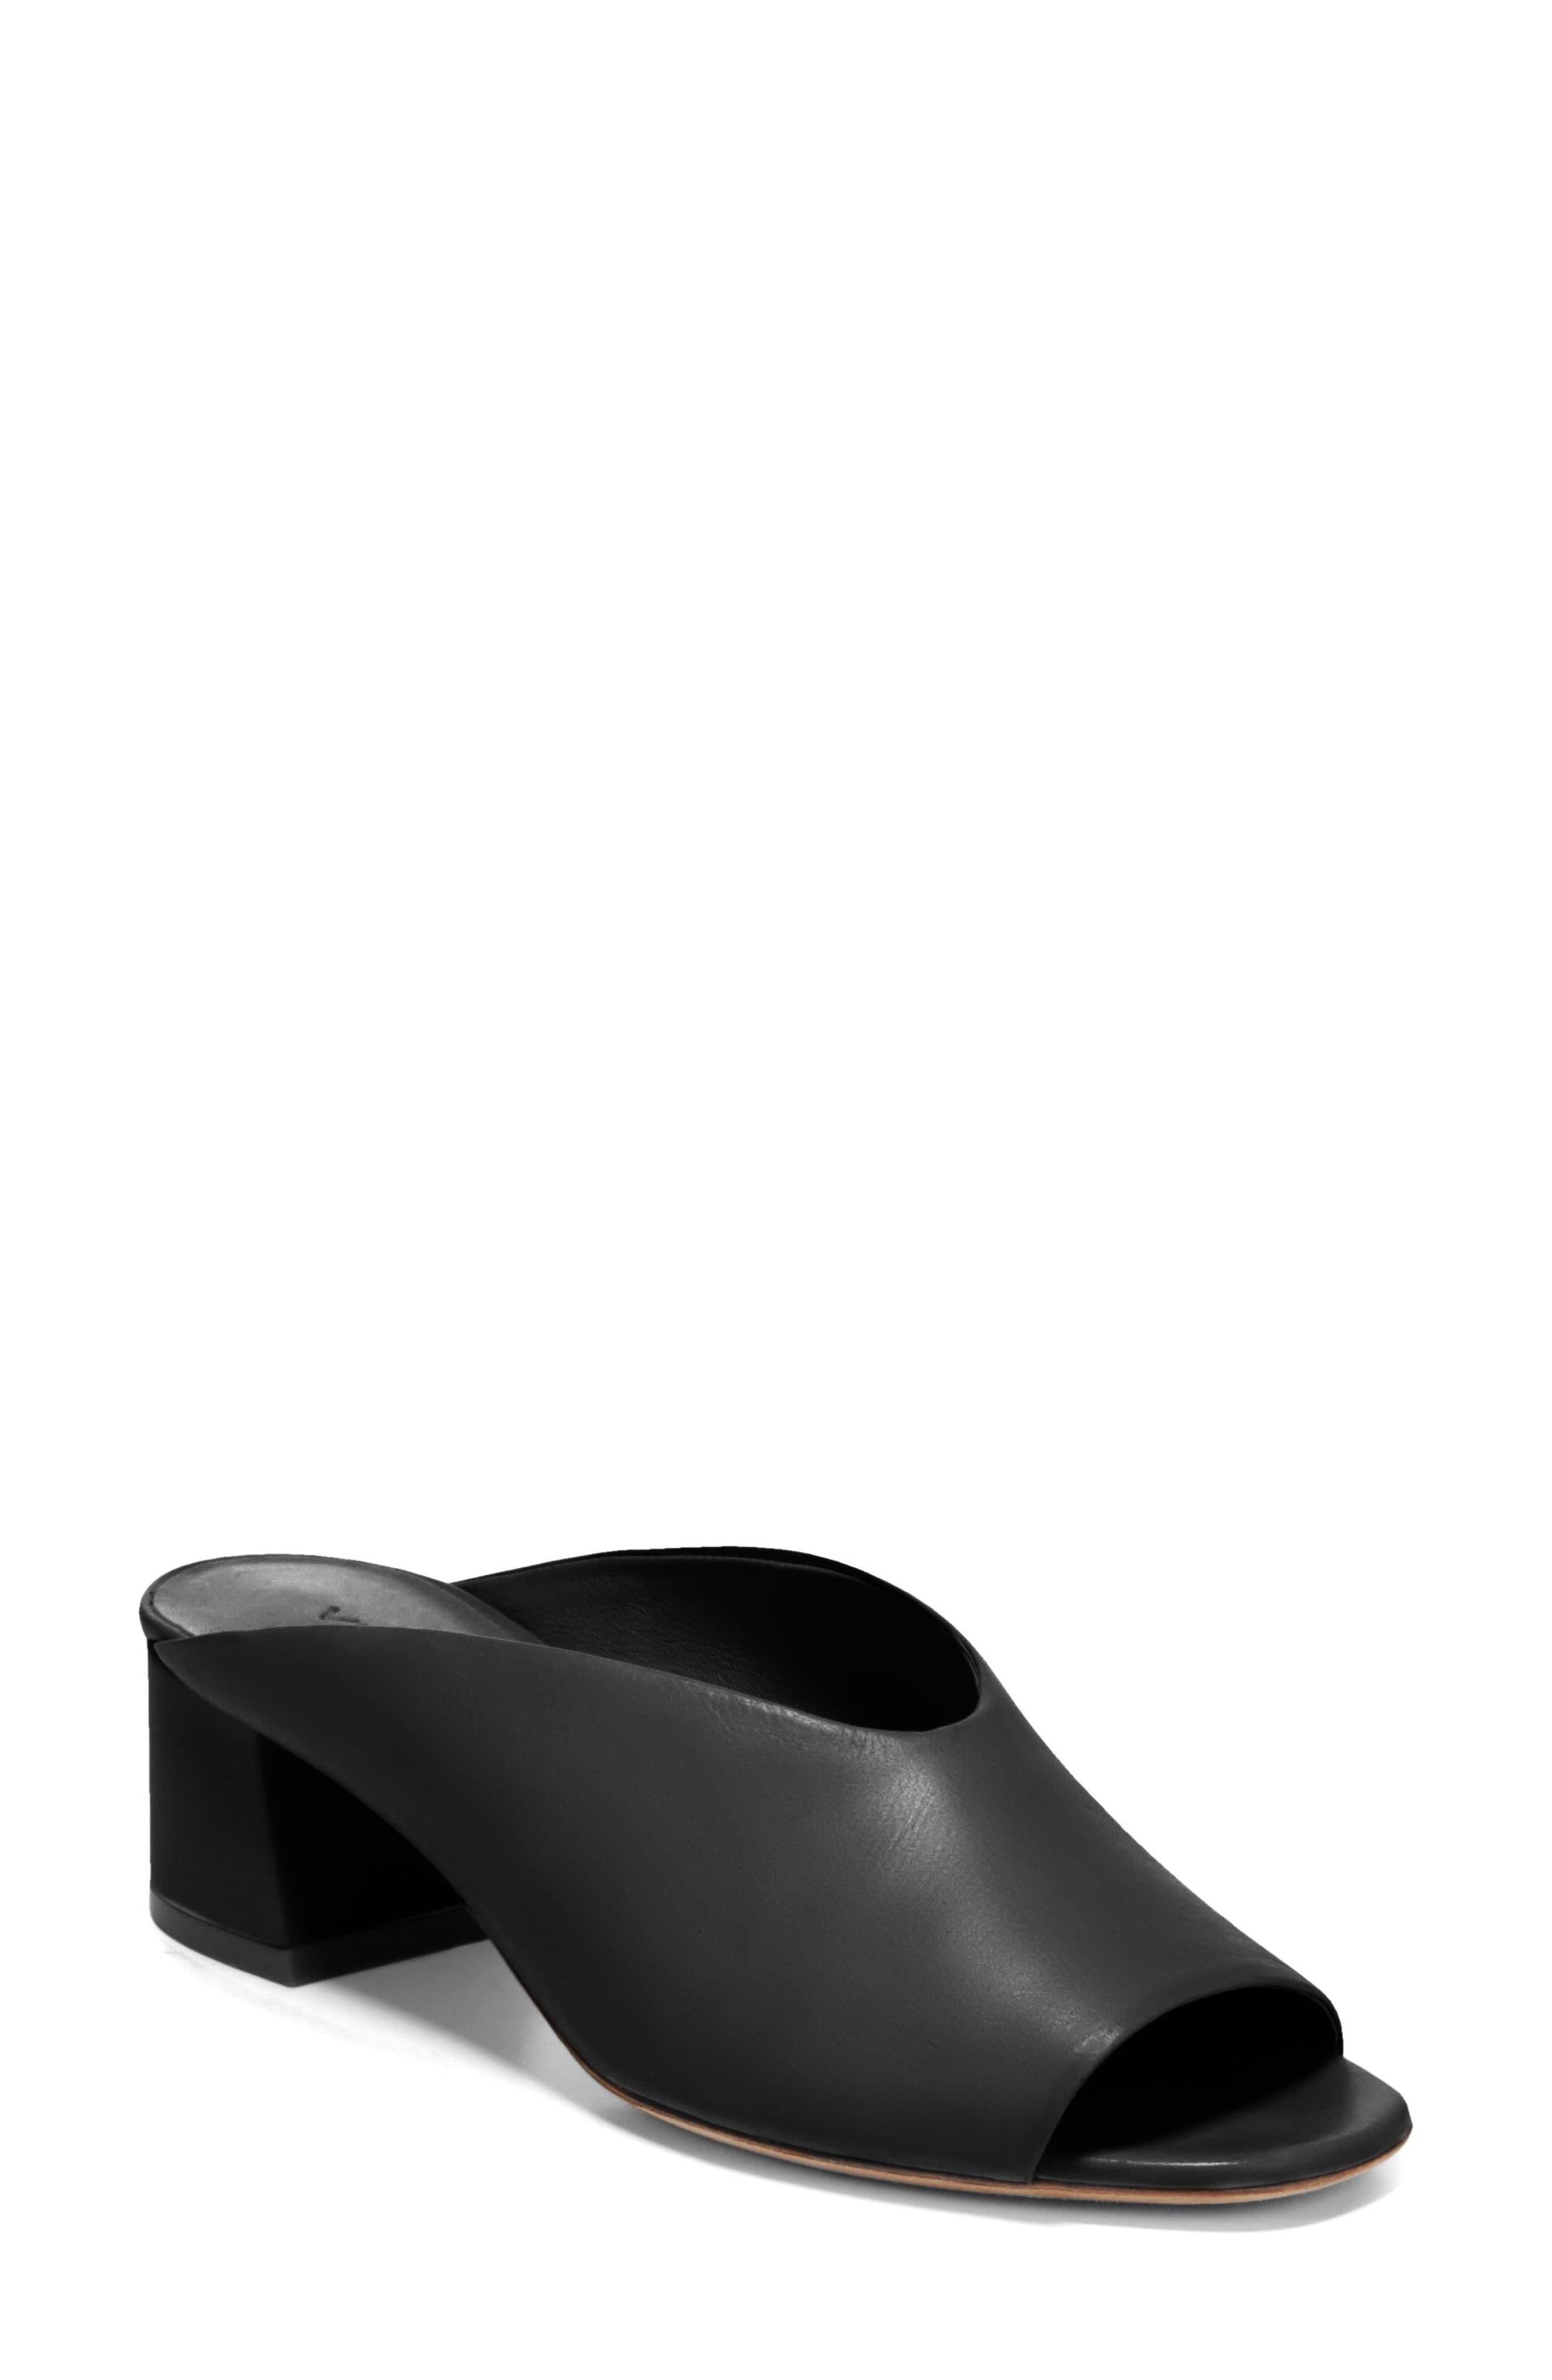 Cachet Sandal,                             Main thumbnail 1, color,                             BLACK SIVIGLIA CALF